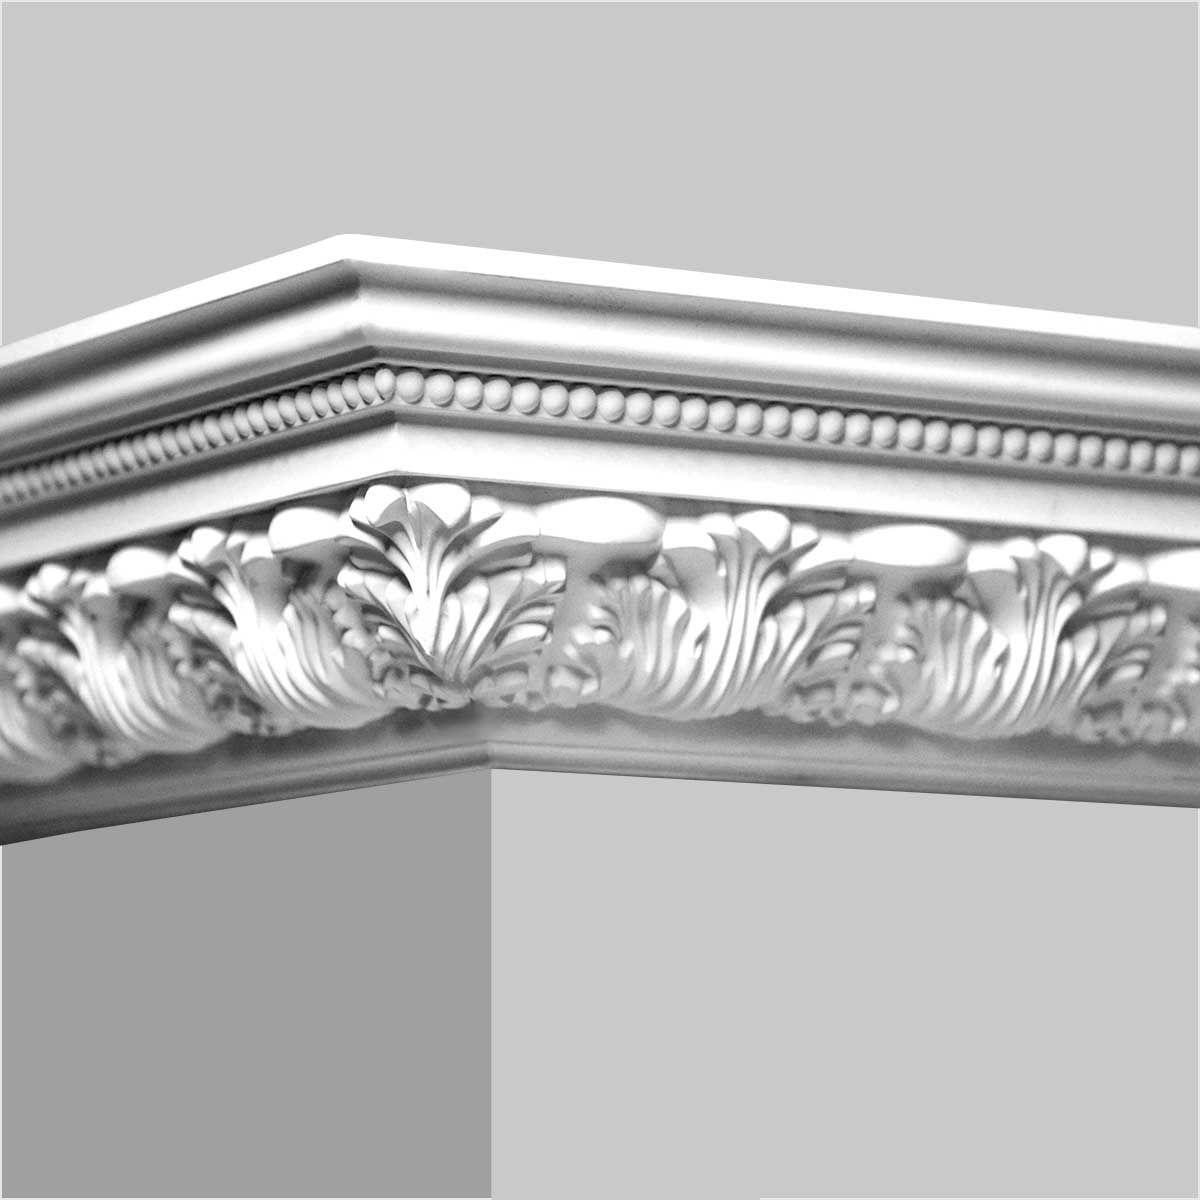 Terrific Pin By Baher Alshaar On Jbs In 2019 Ceiling Decor Wood Machost Co Dining Chair Design Ideas Machostcouk